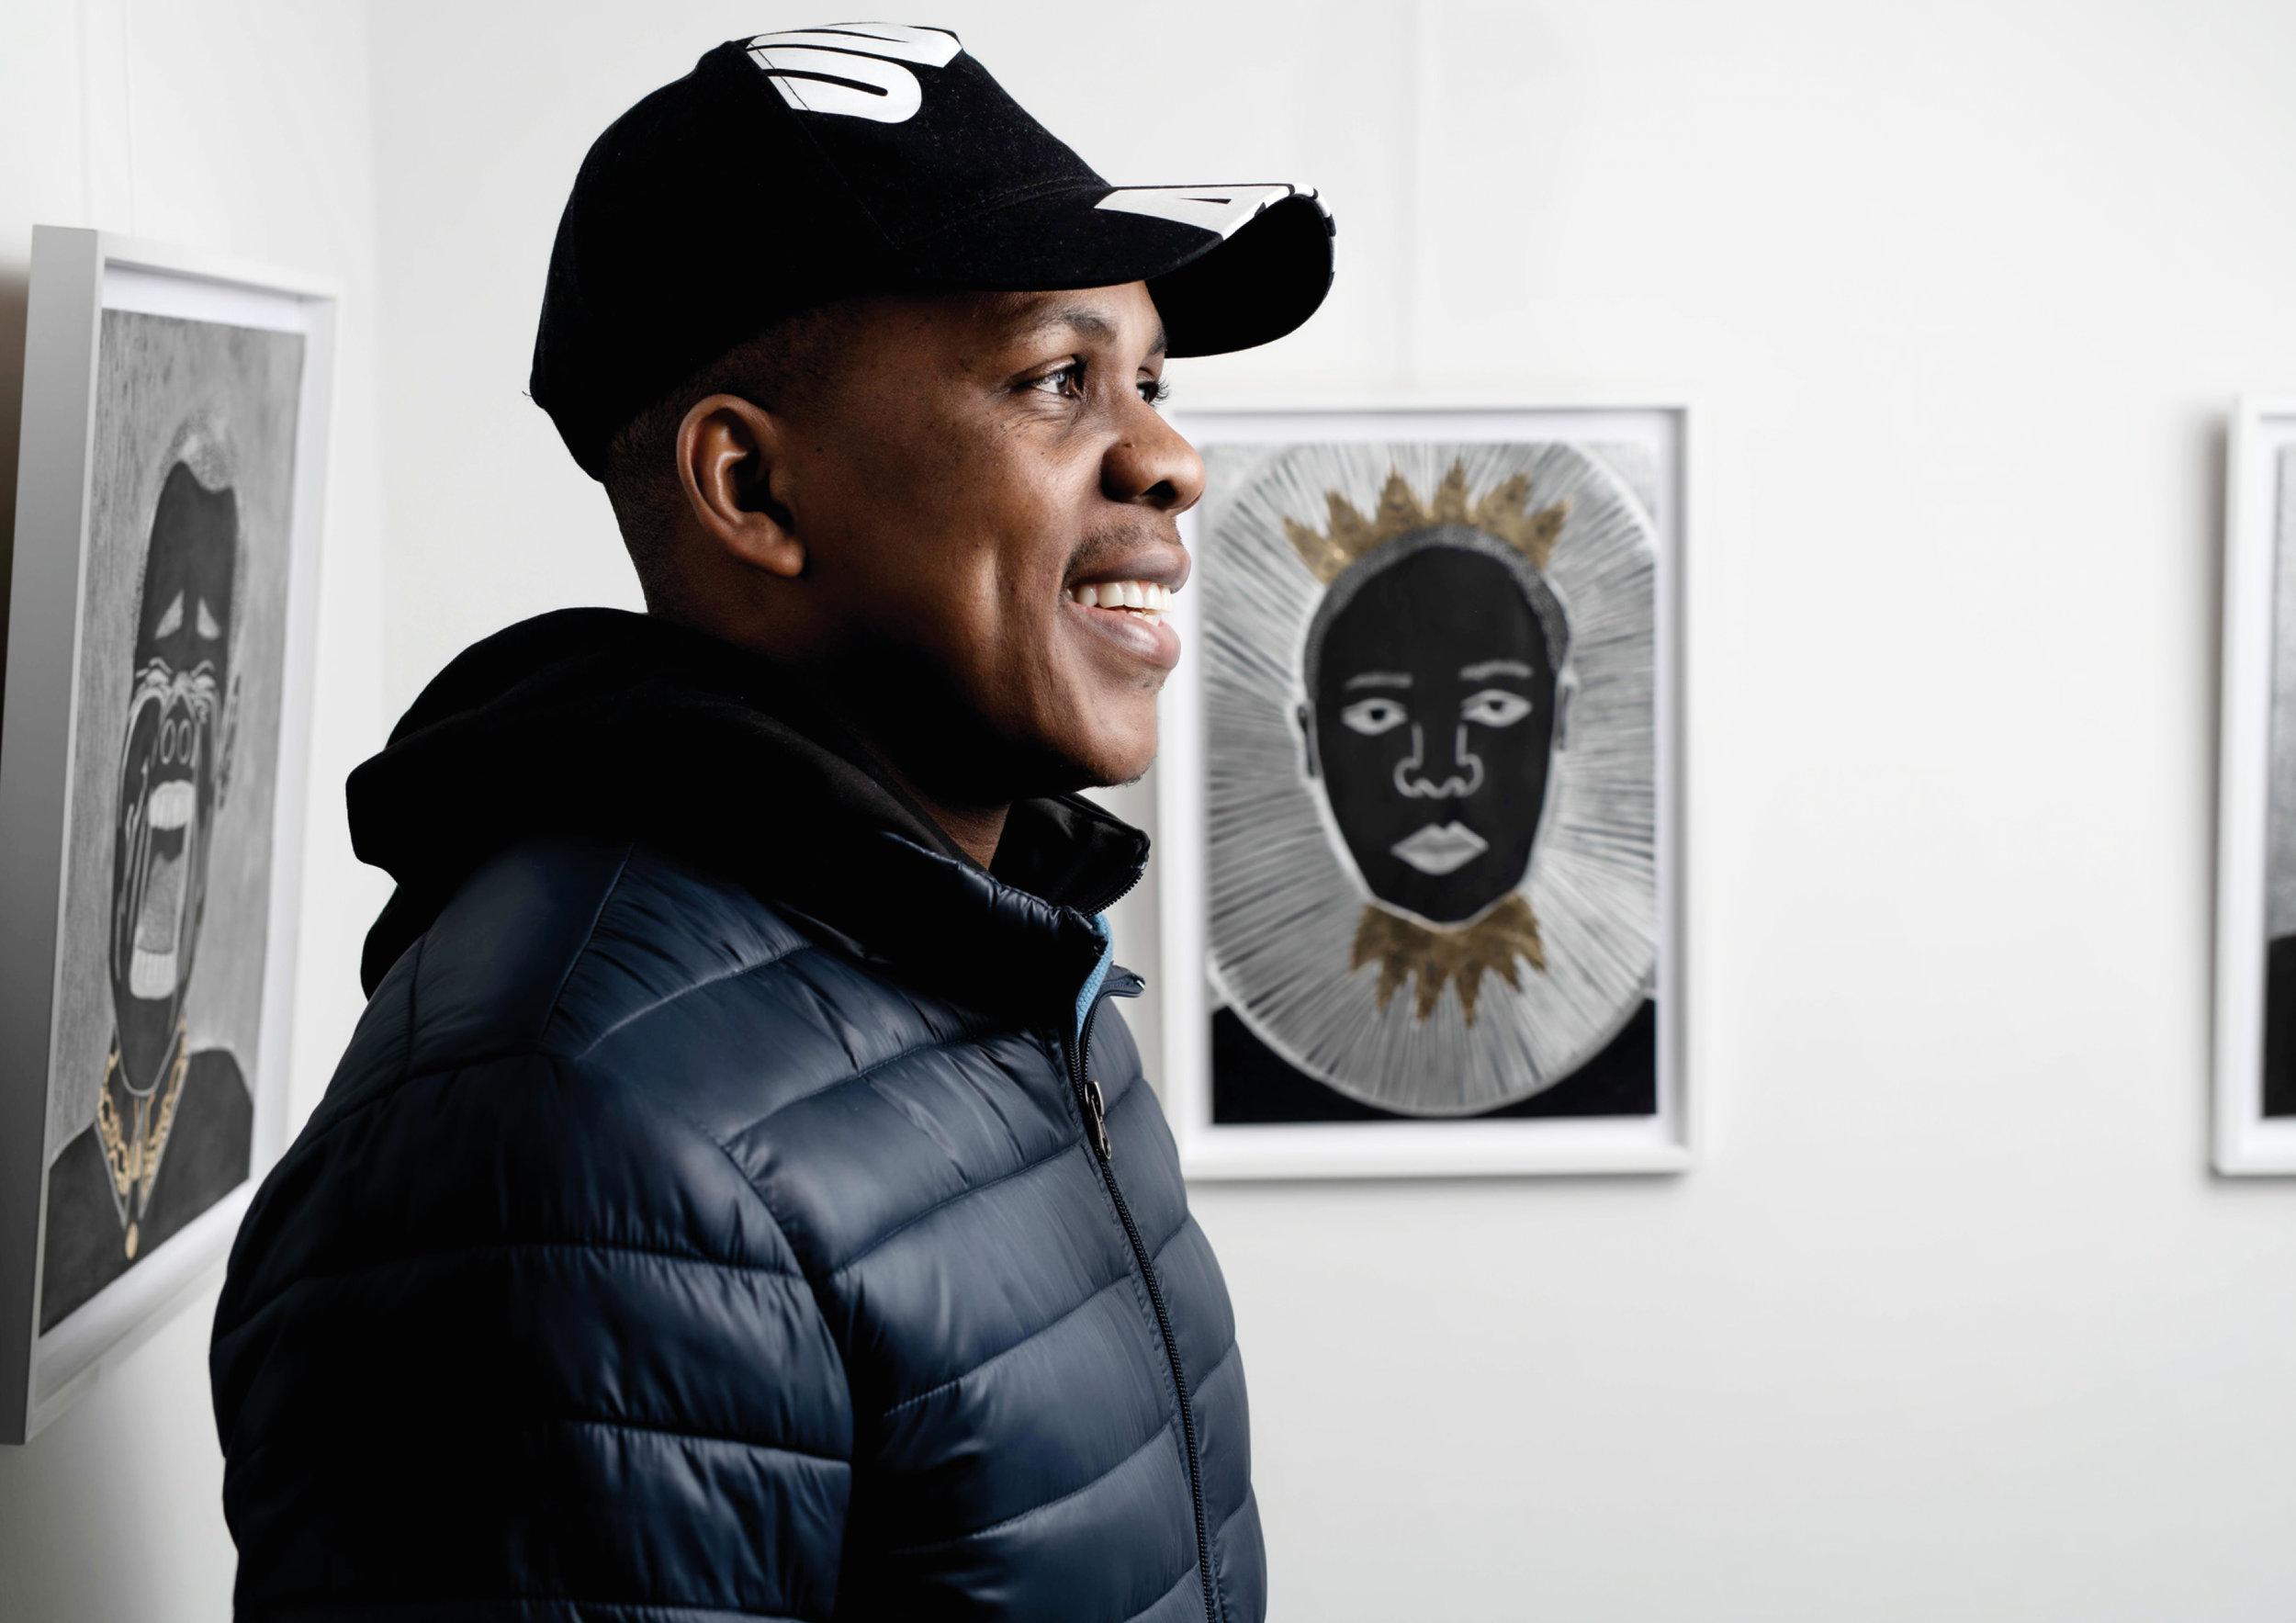 O'Maurice Mboa – März 2019